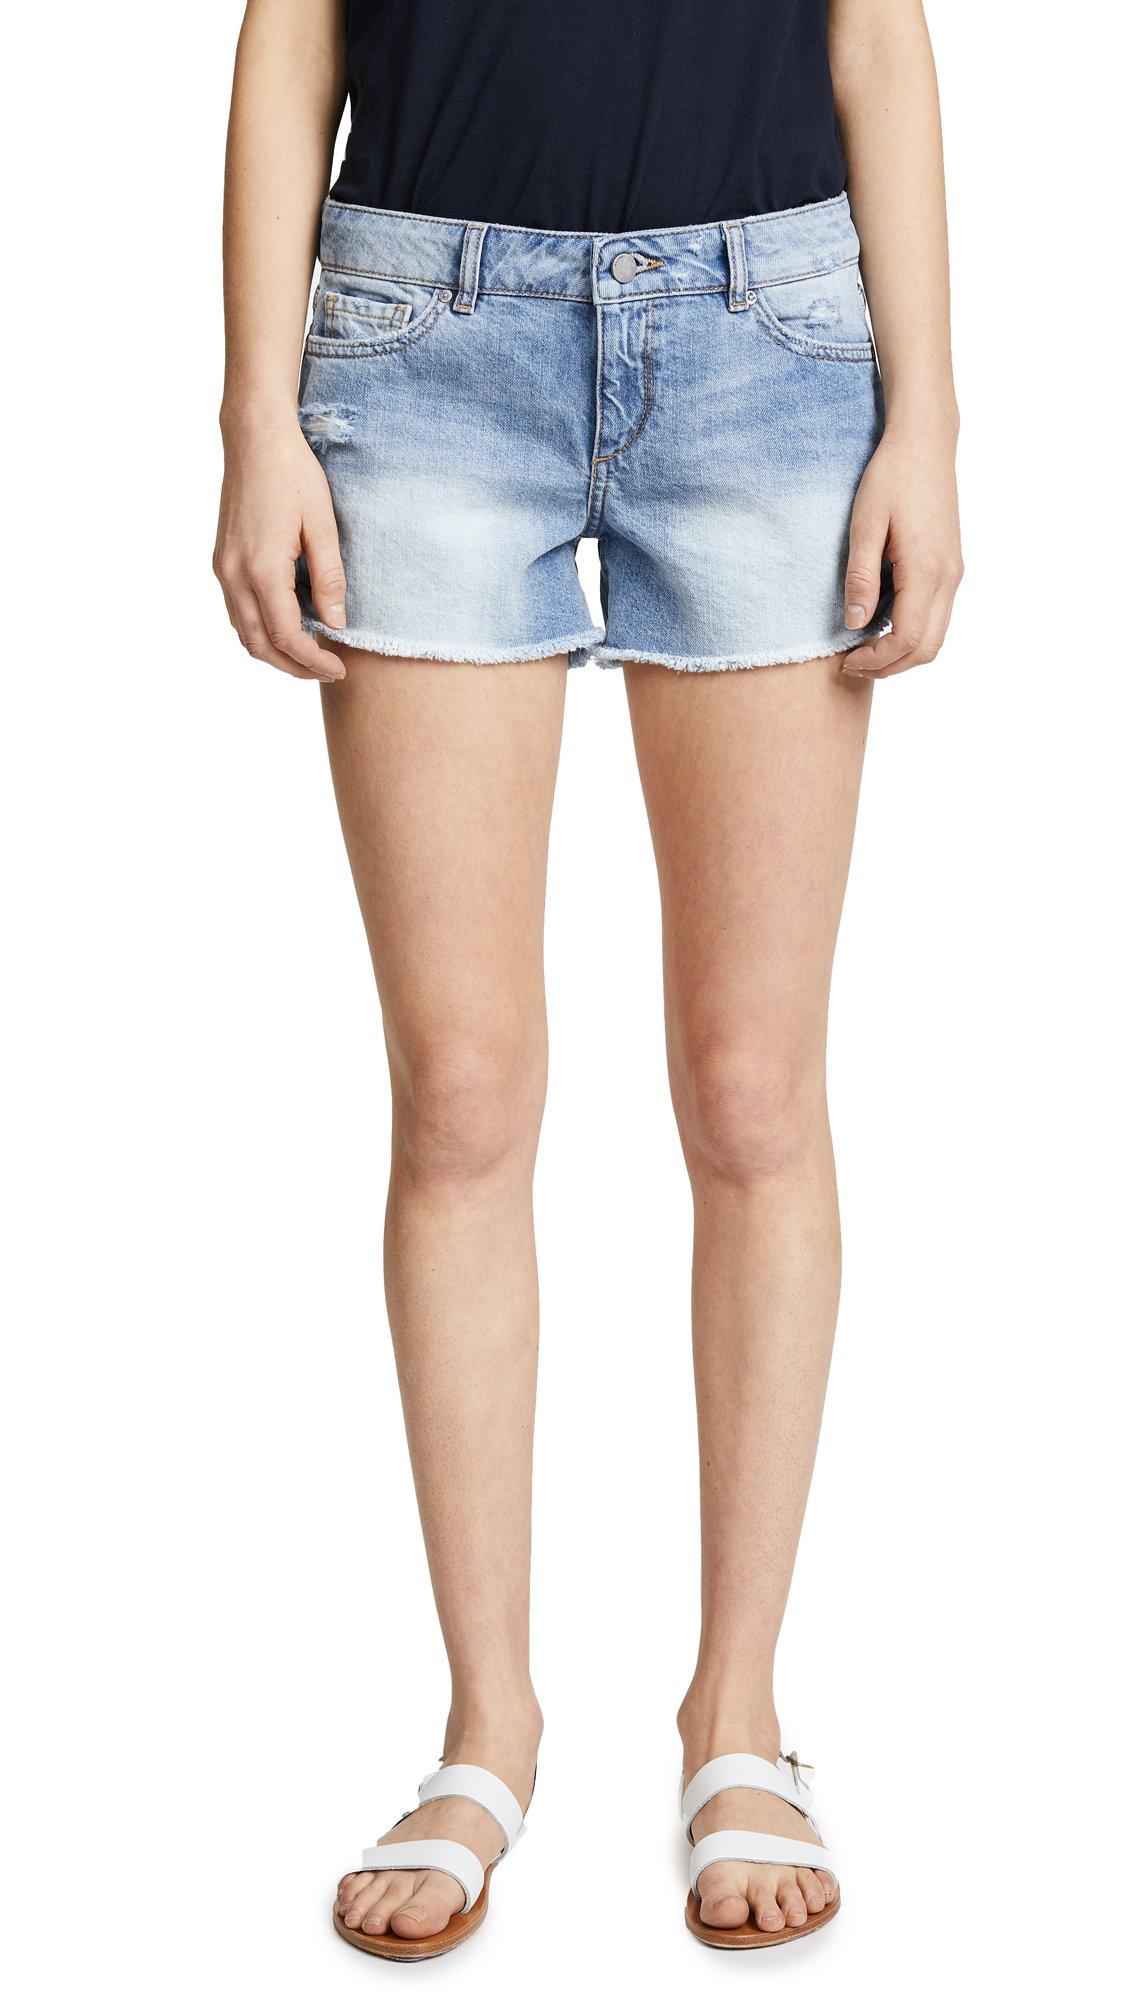 DL1961 Women's Karlie Boyfriend Shorts, Westside, 32